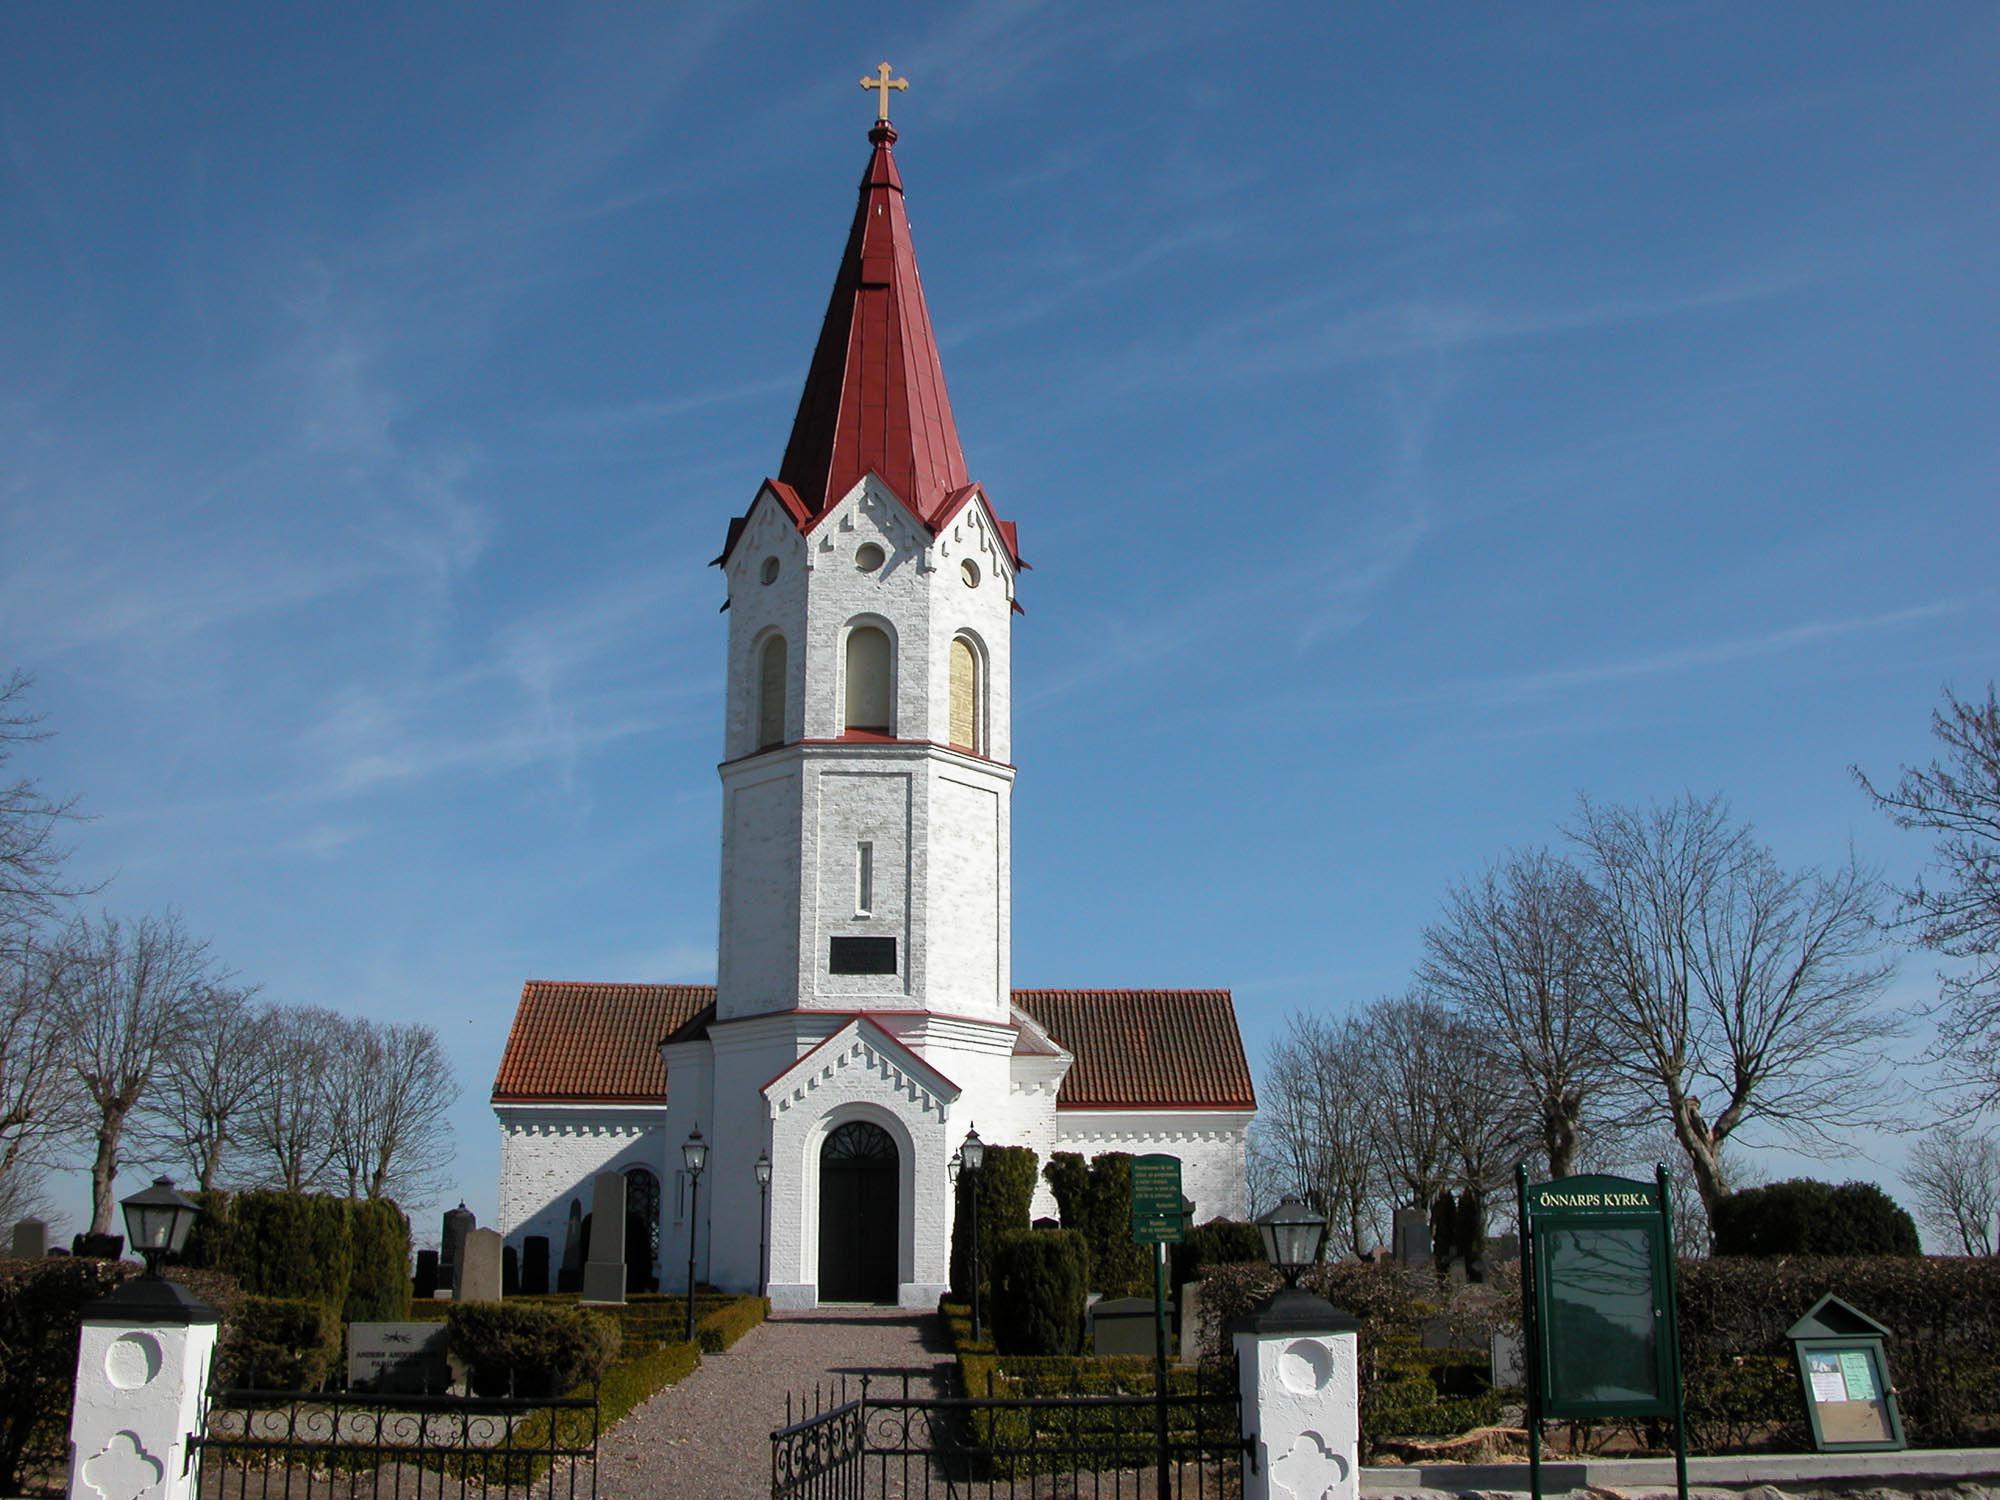 Önnarps kyrka